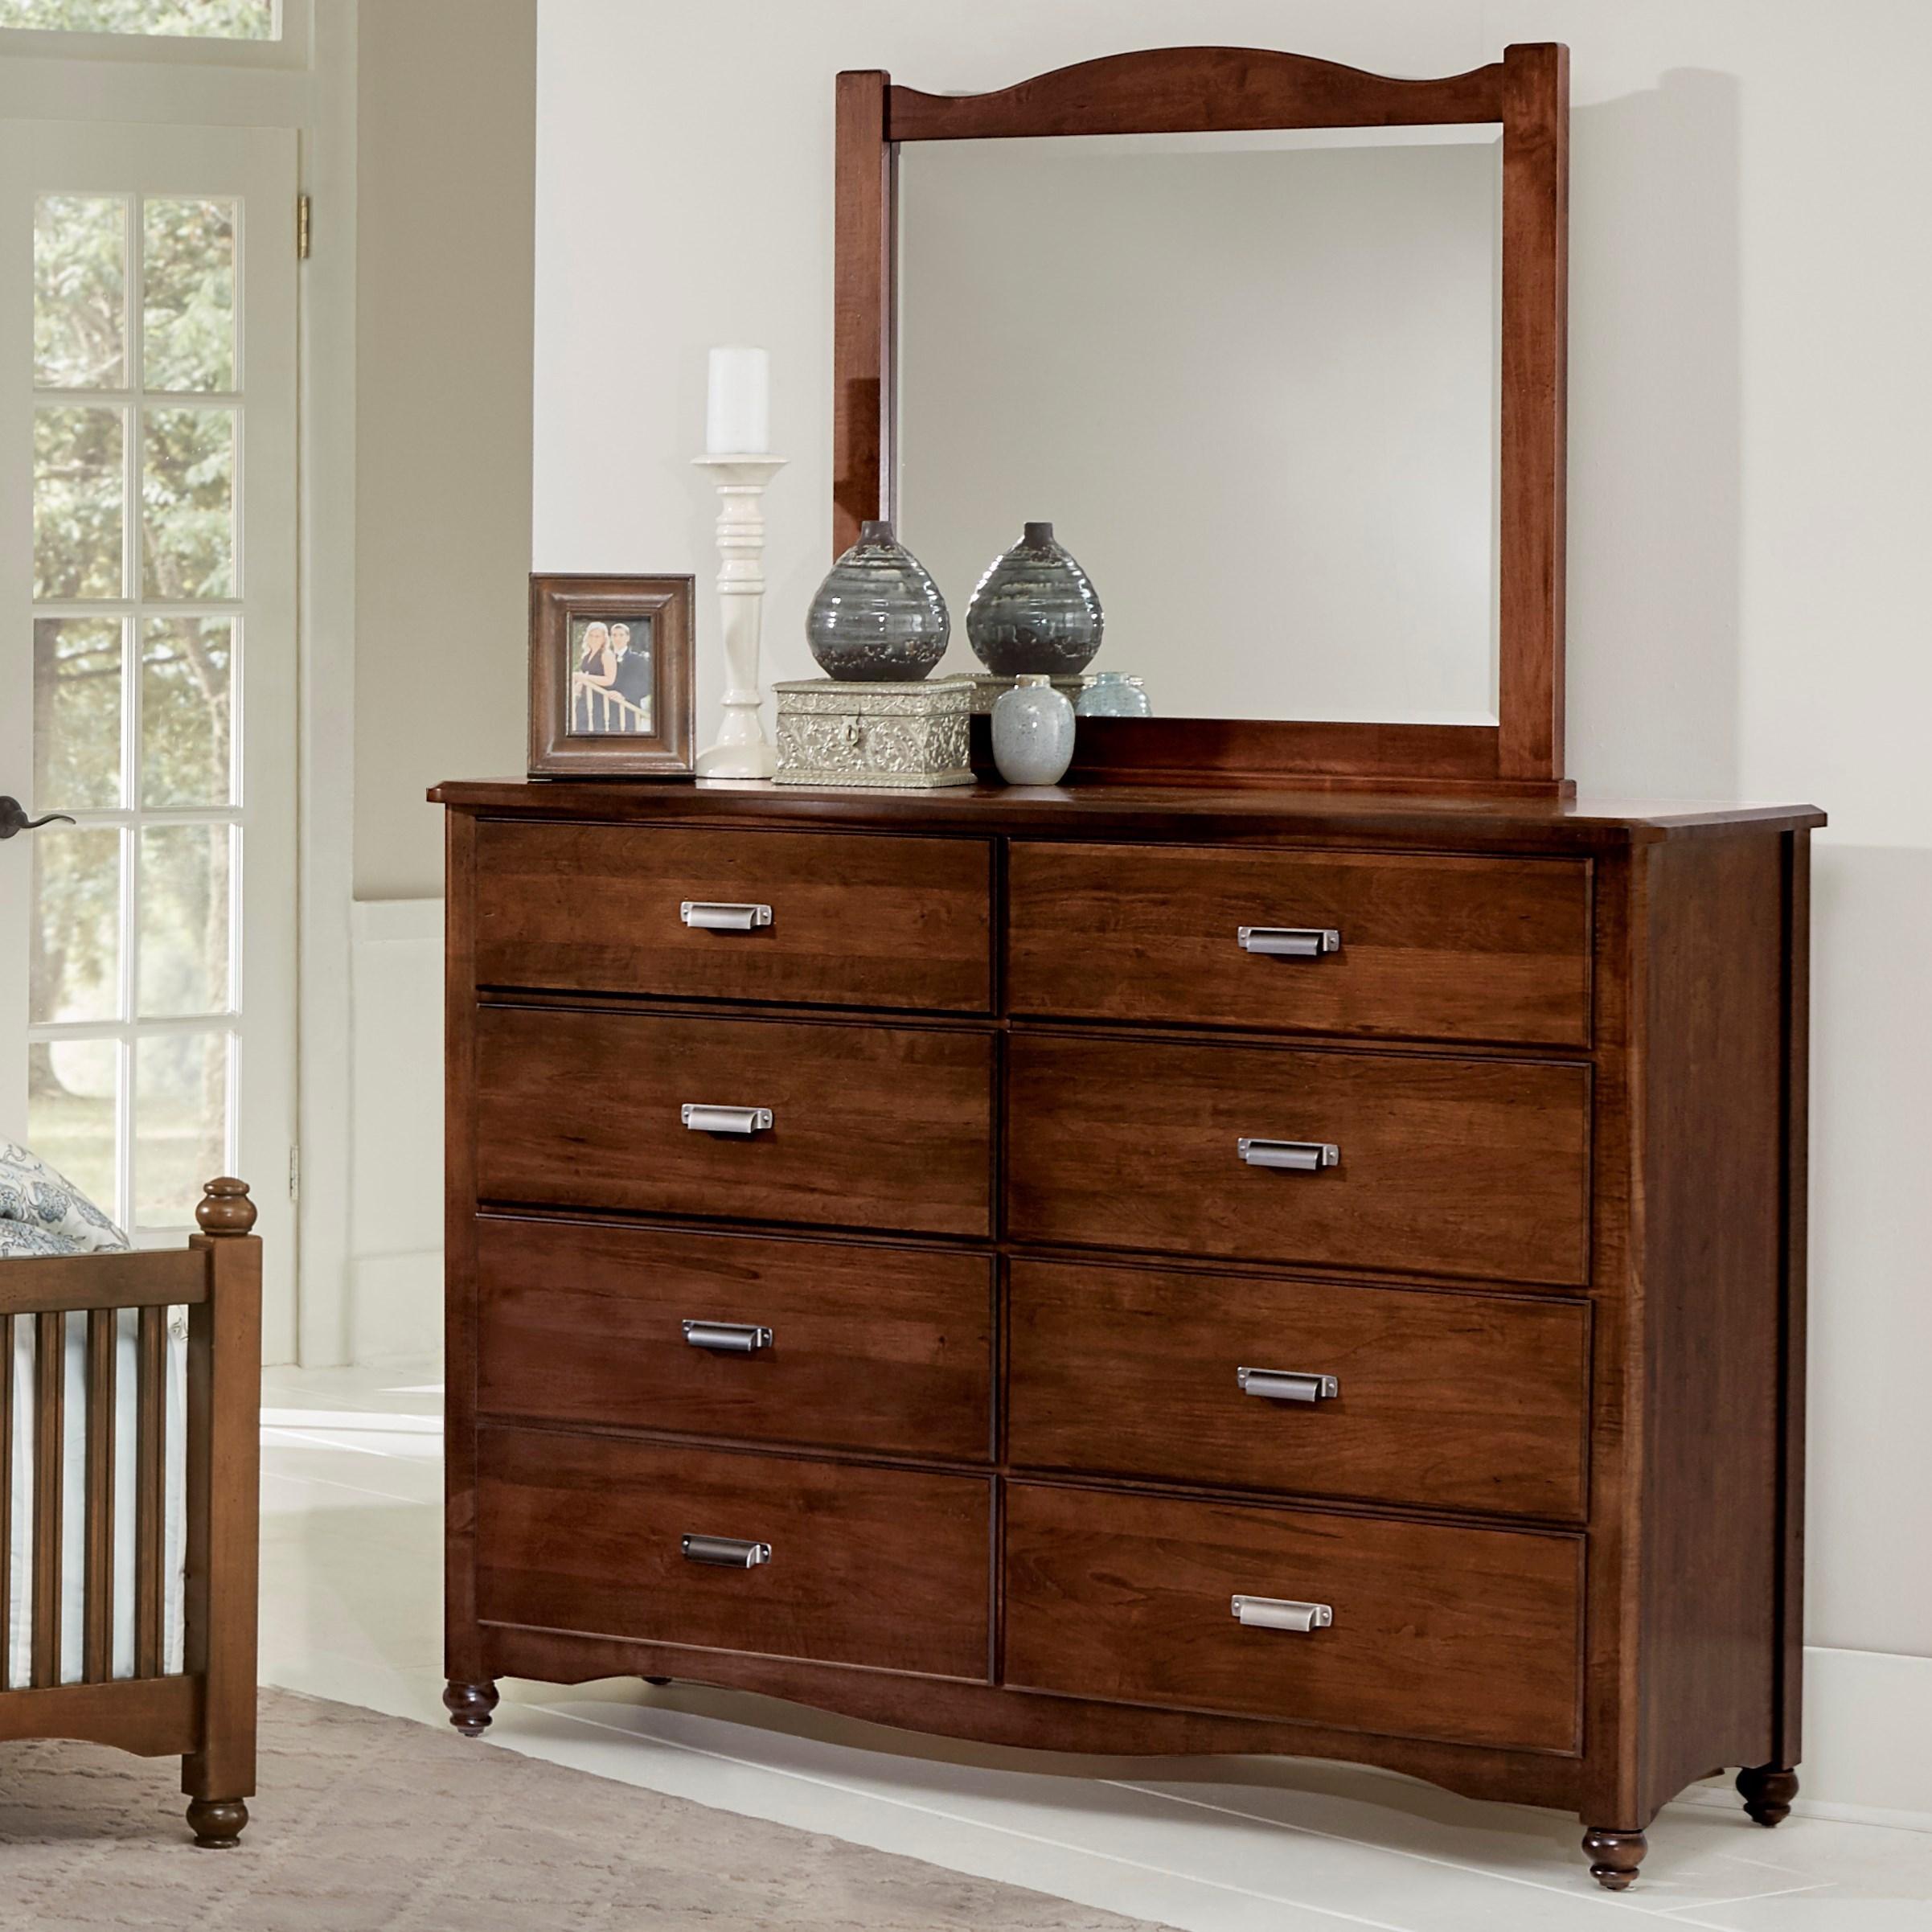 Vaughan bassett american maple solid wood bureau landscape mirror dunk bright furniture for Solid maple bedroom furniture